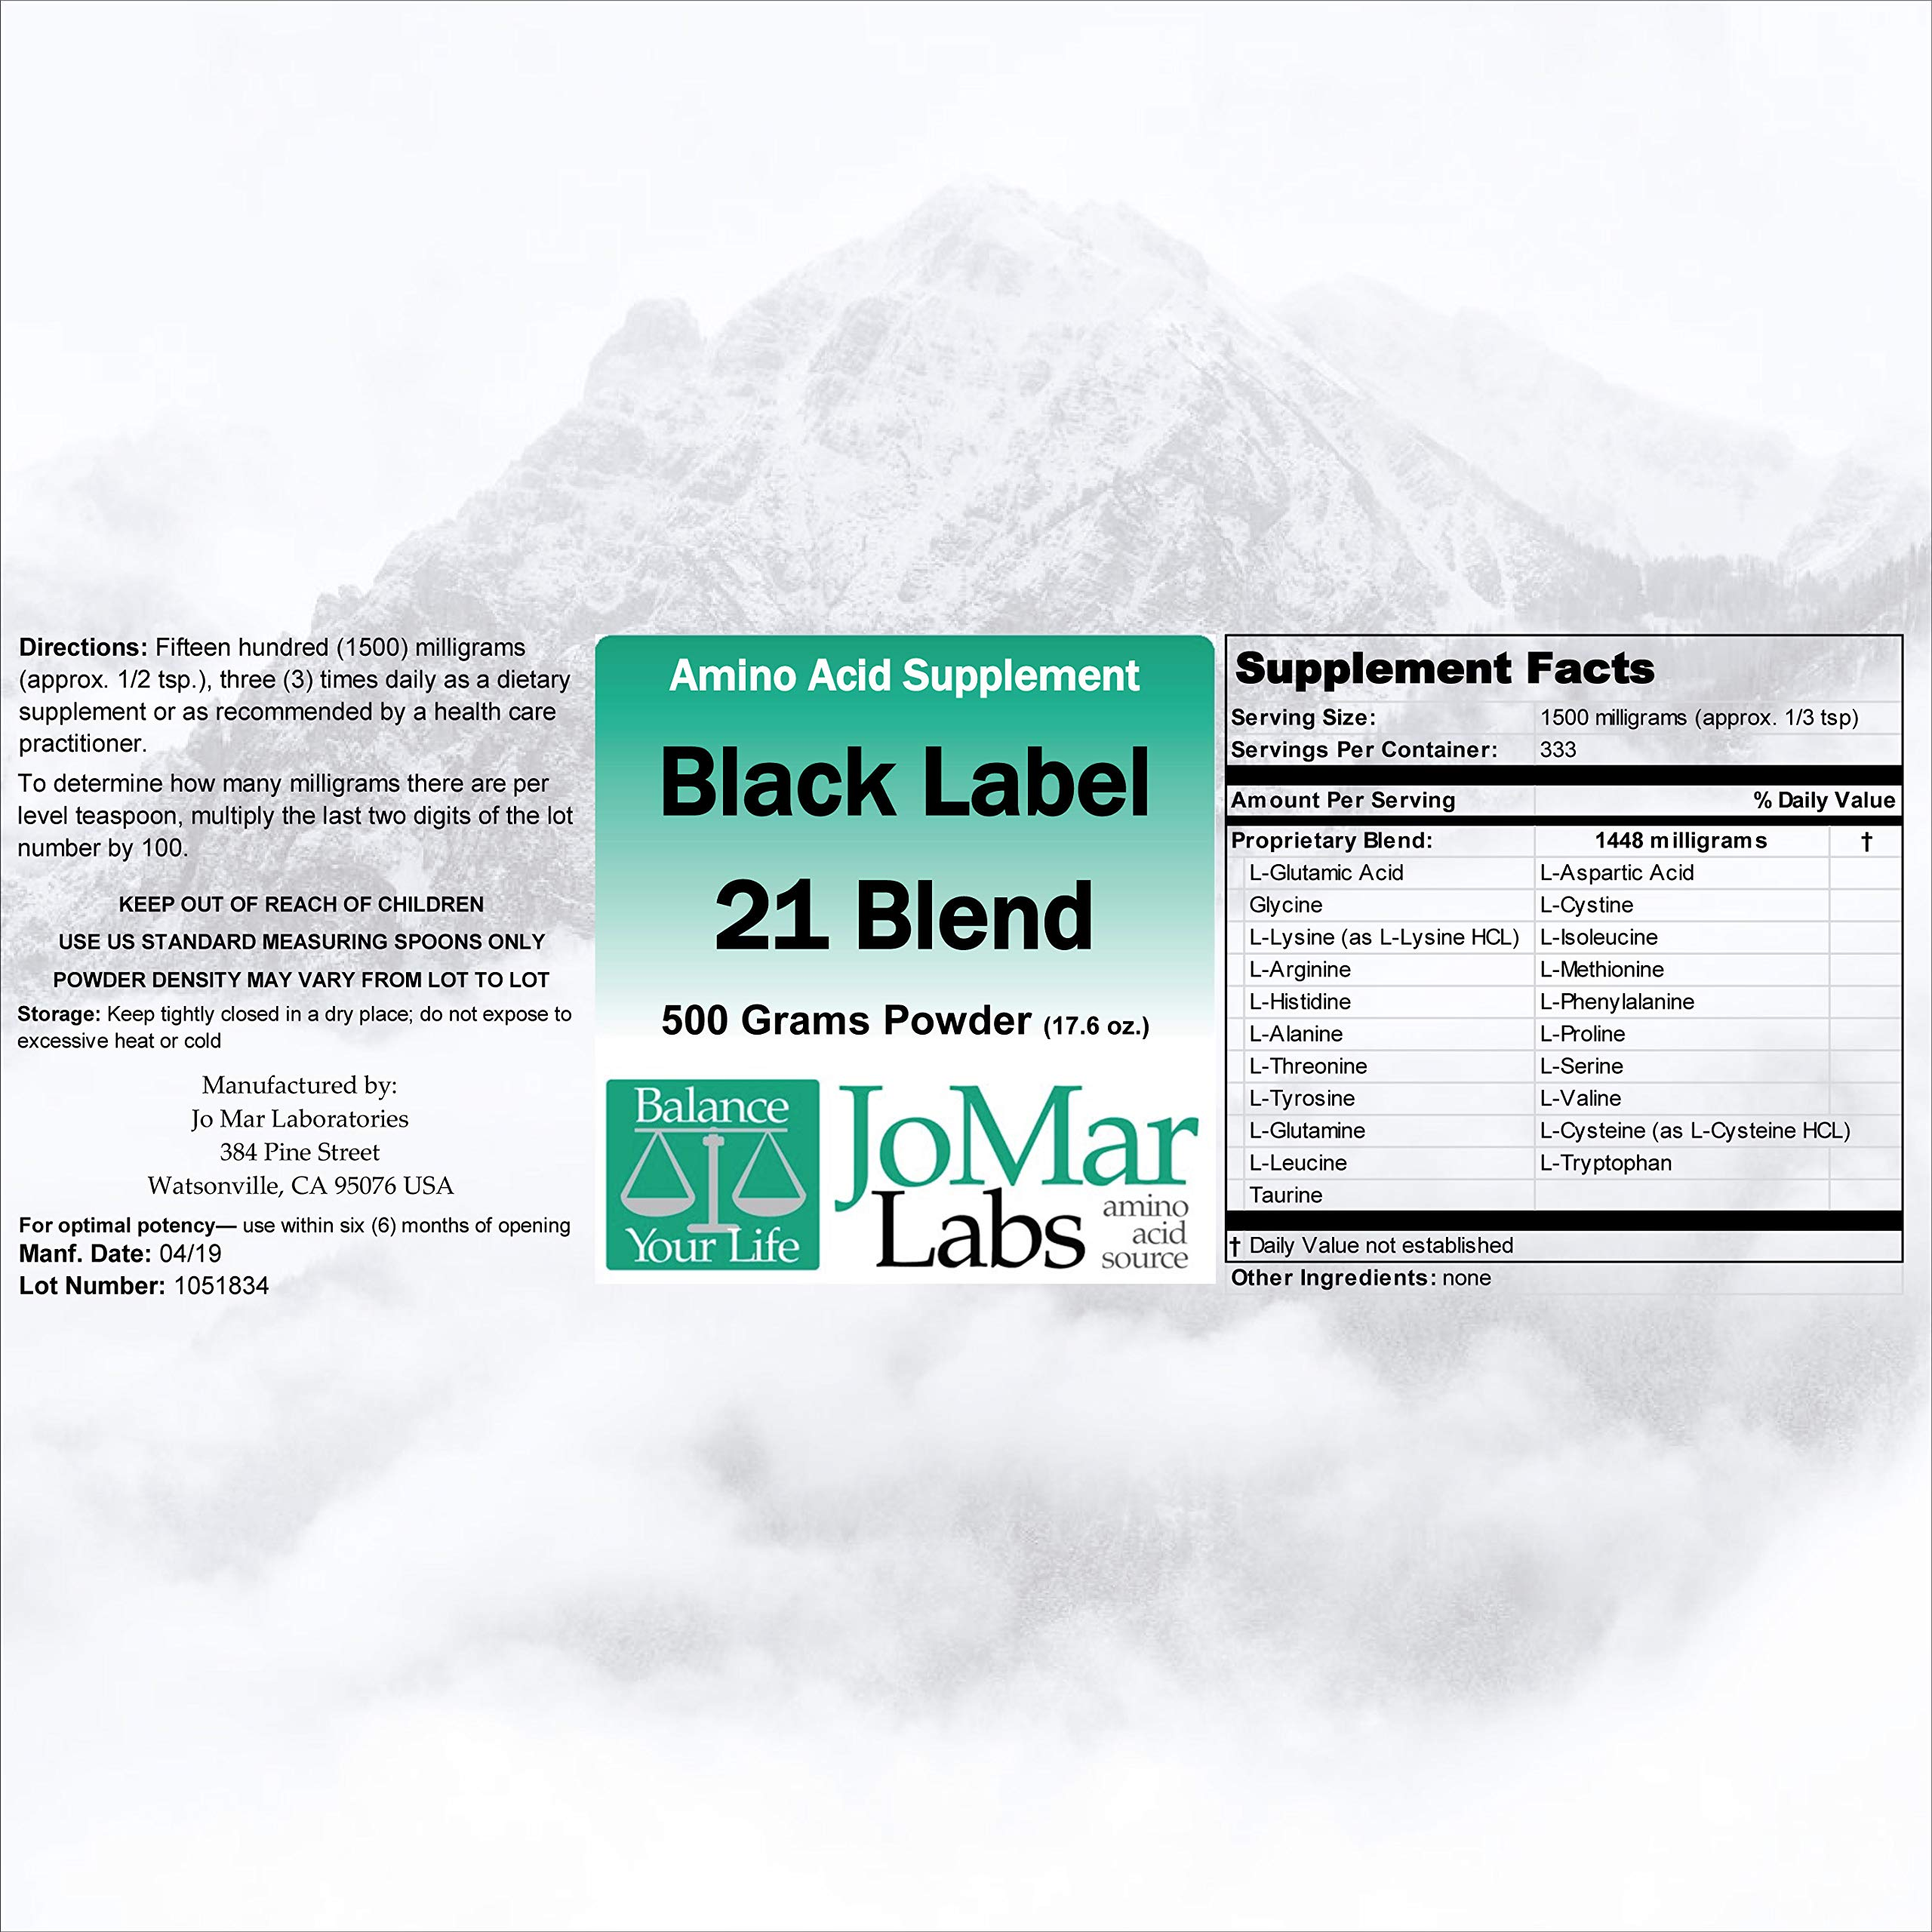 Jo Mar Labs Black Label Pure Form 21 Blend 500 g Powder by Jo Mar Labs